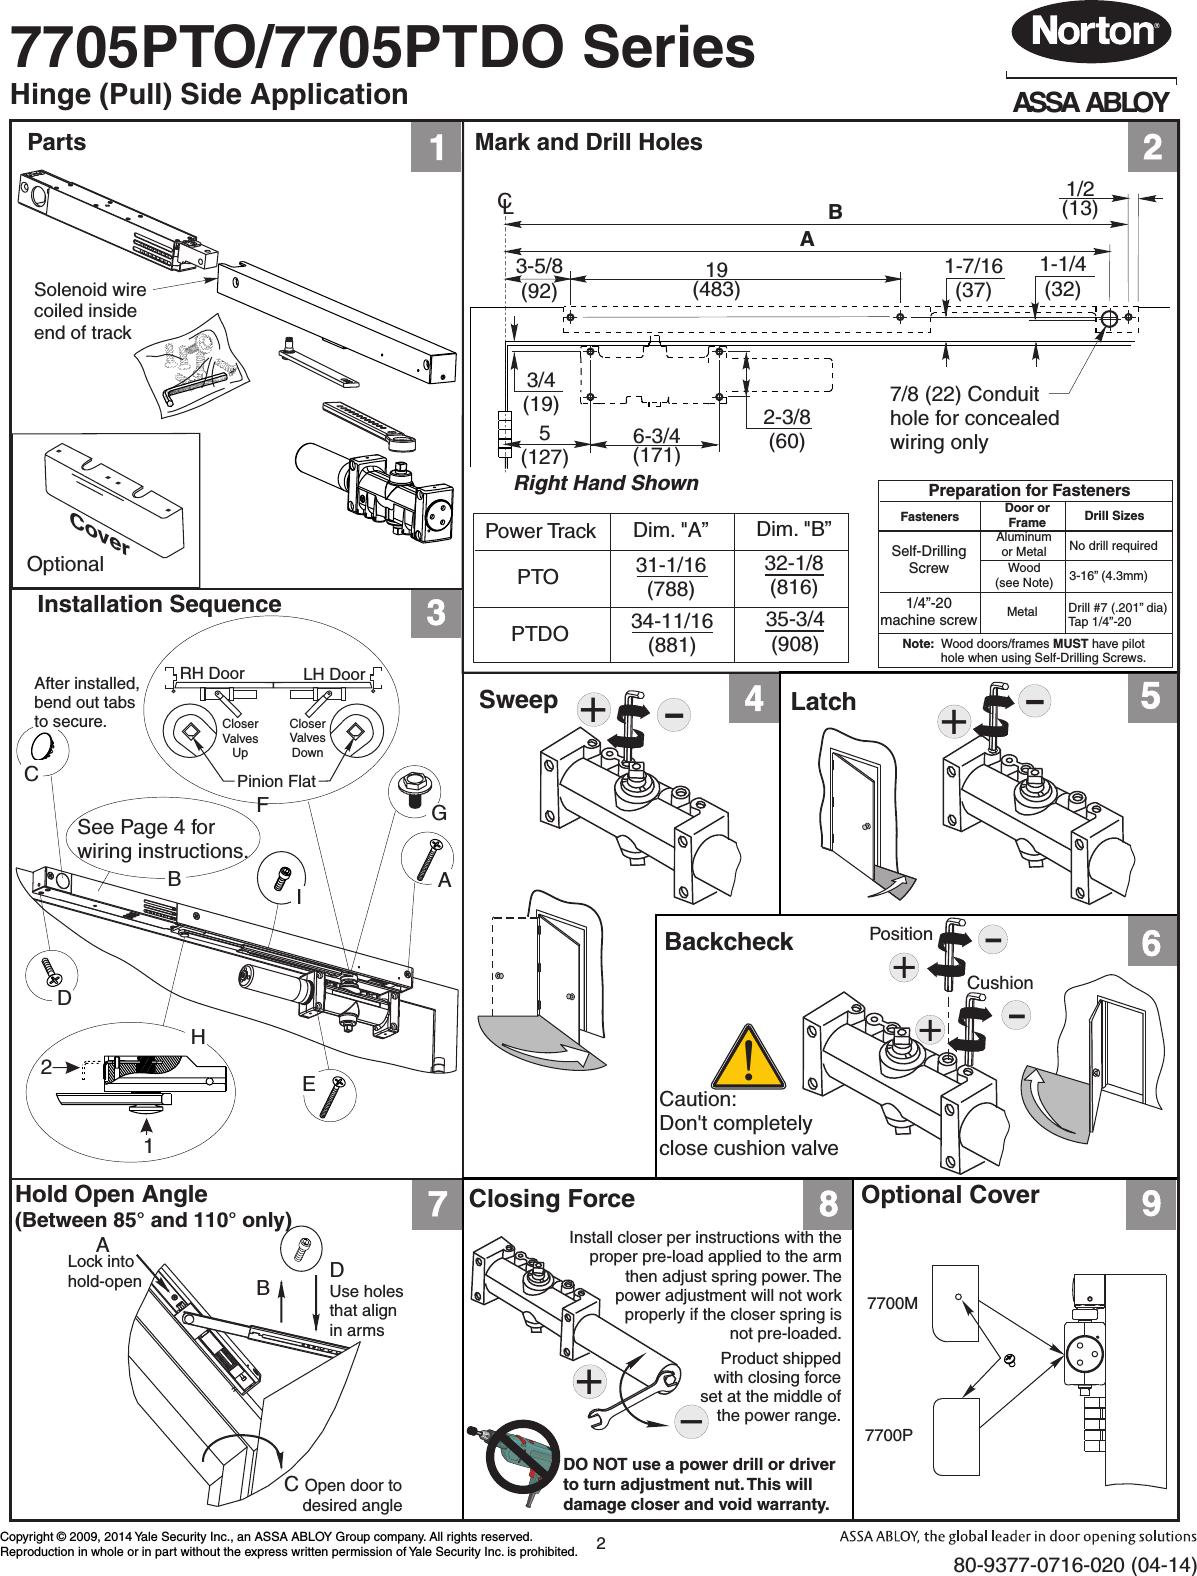 hight resolution of norton commando wiring diagram page 4 wiring diagram and schematics bmw wiring diagram 1975 norton commando wiring diagram